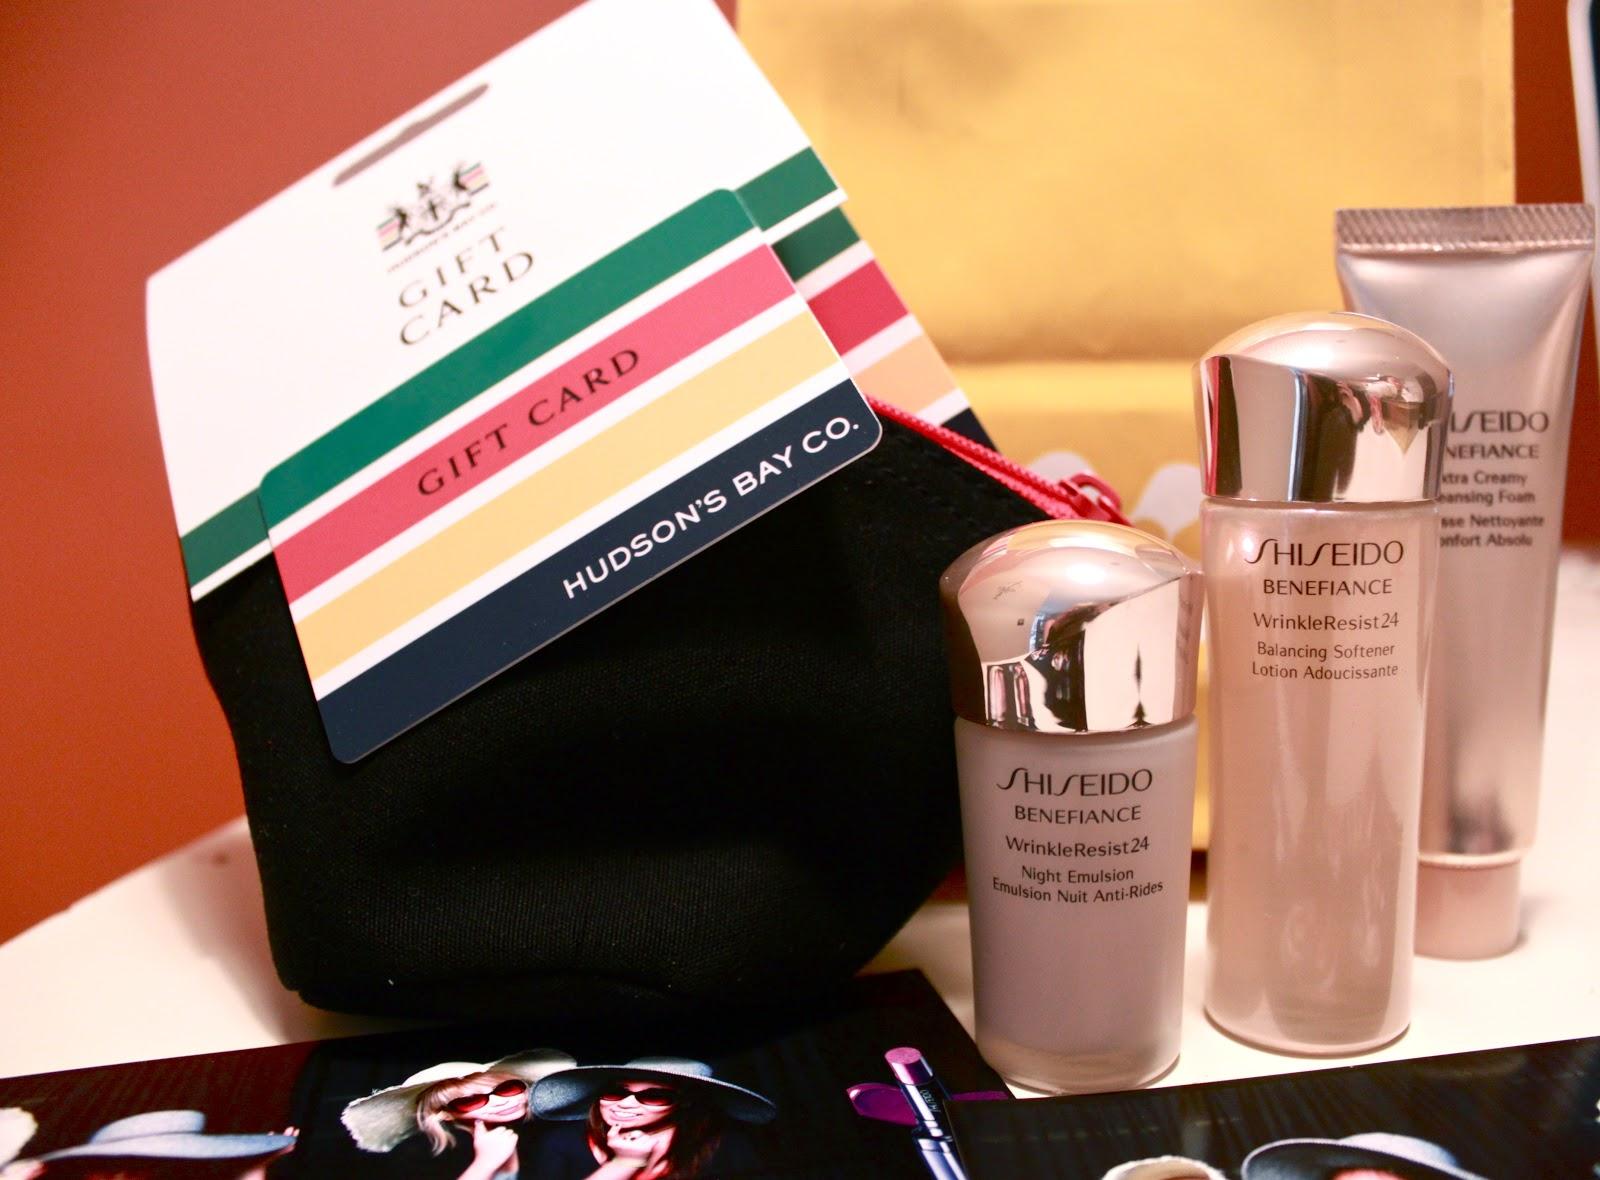 shiseido gift card